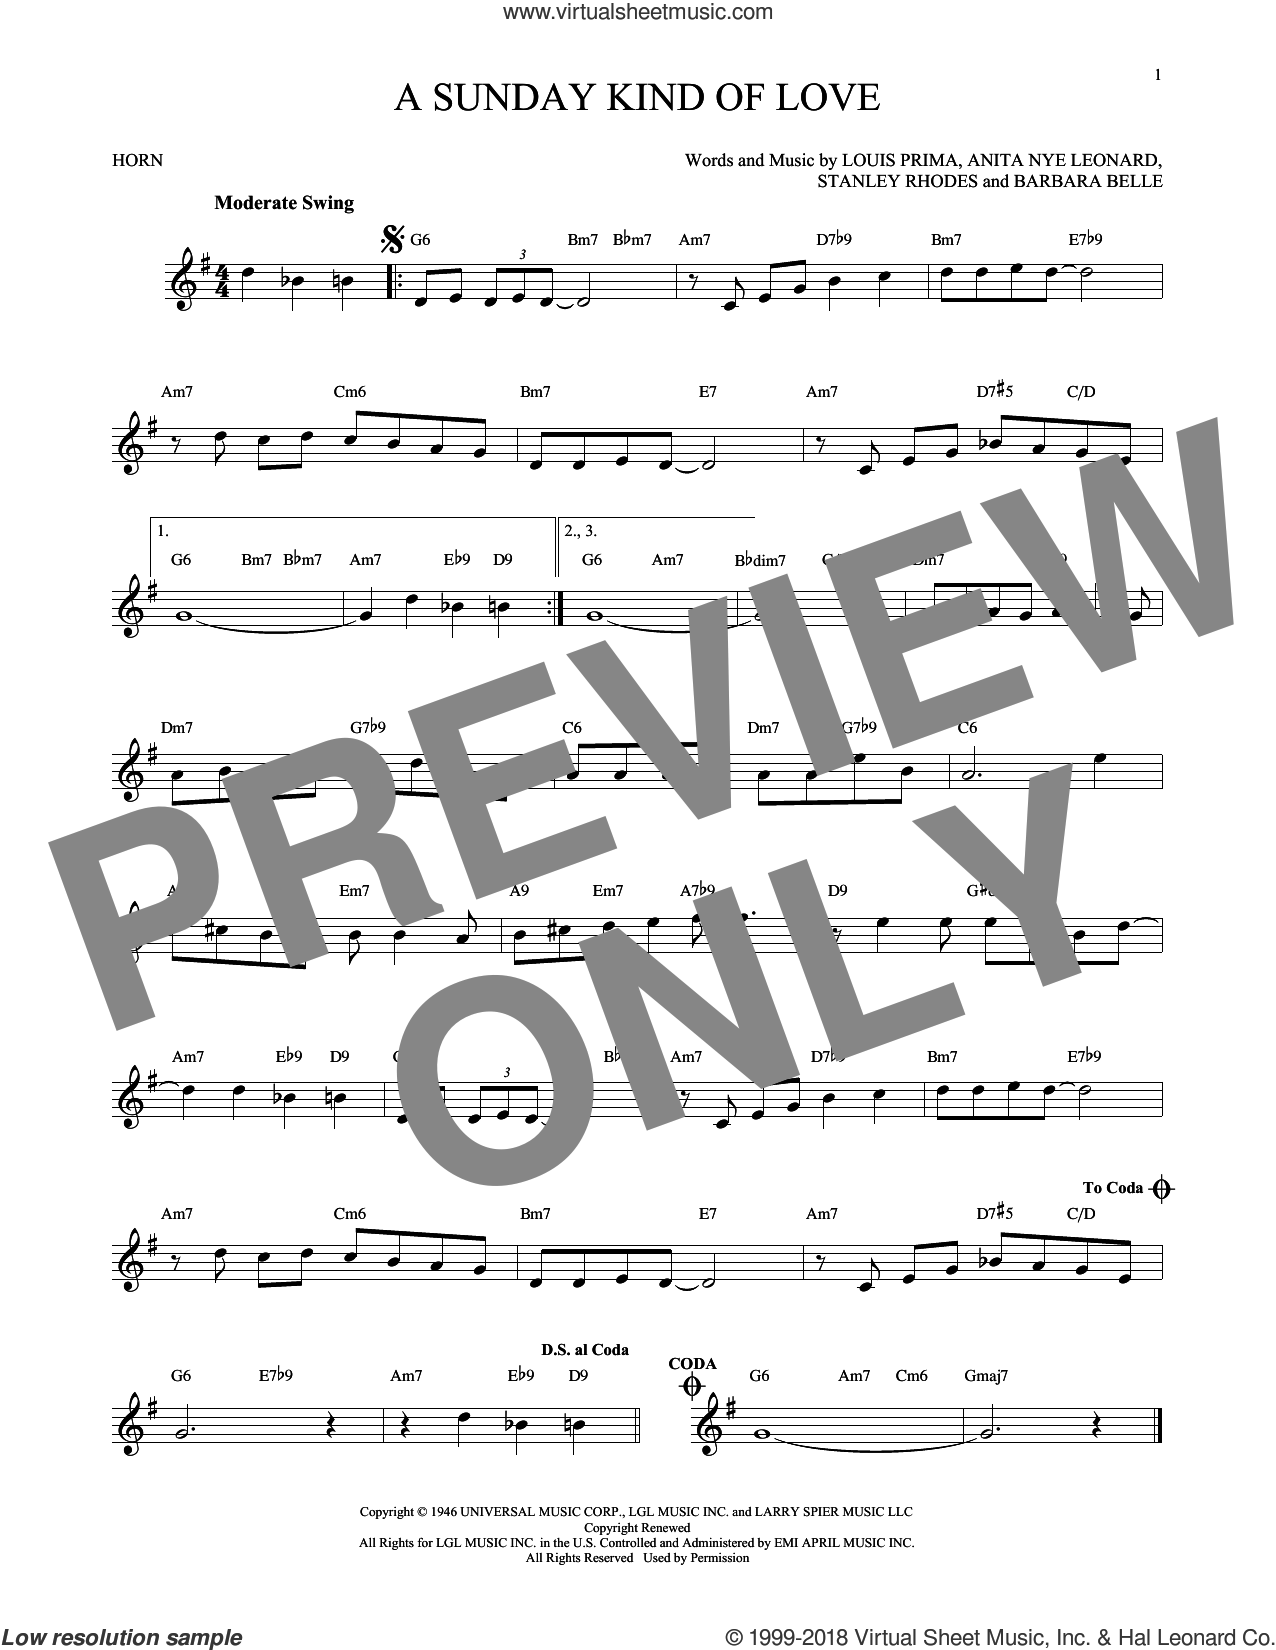 A Sunday Kind Of Love sheet music for horn solo by Etta James, Reba McEntire, Anita Nye Leonard, Barbara Belle, Louis Prima and Stanley Rhodes, intermediate skill level